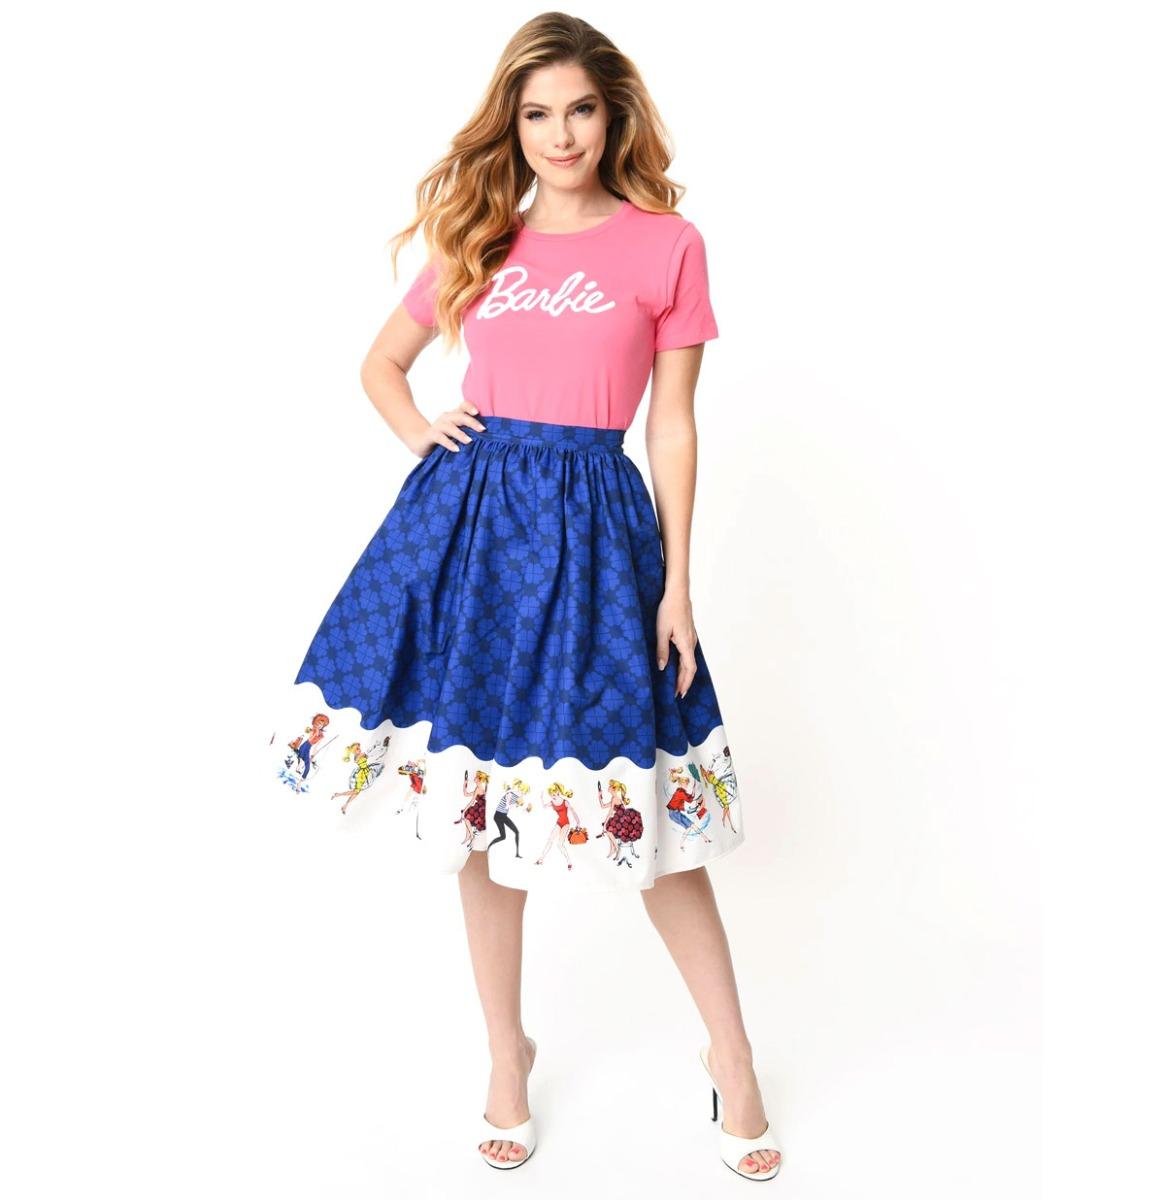 fiftiesstore My Barbie Collection Swing Skirt Blauw